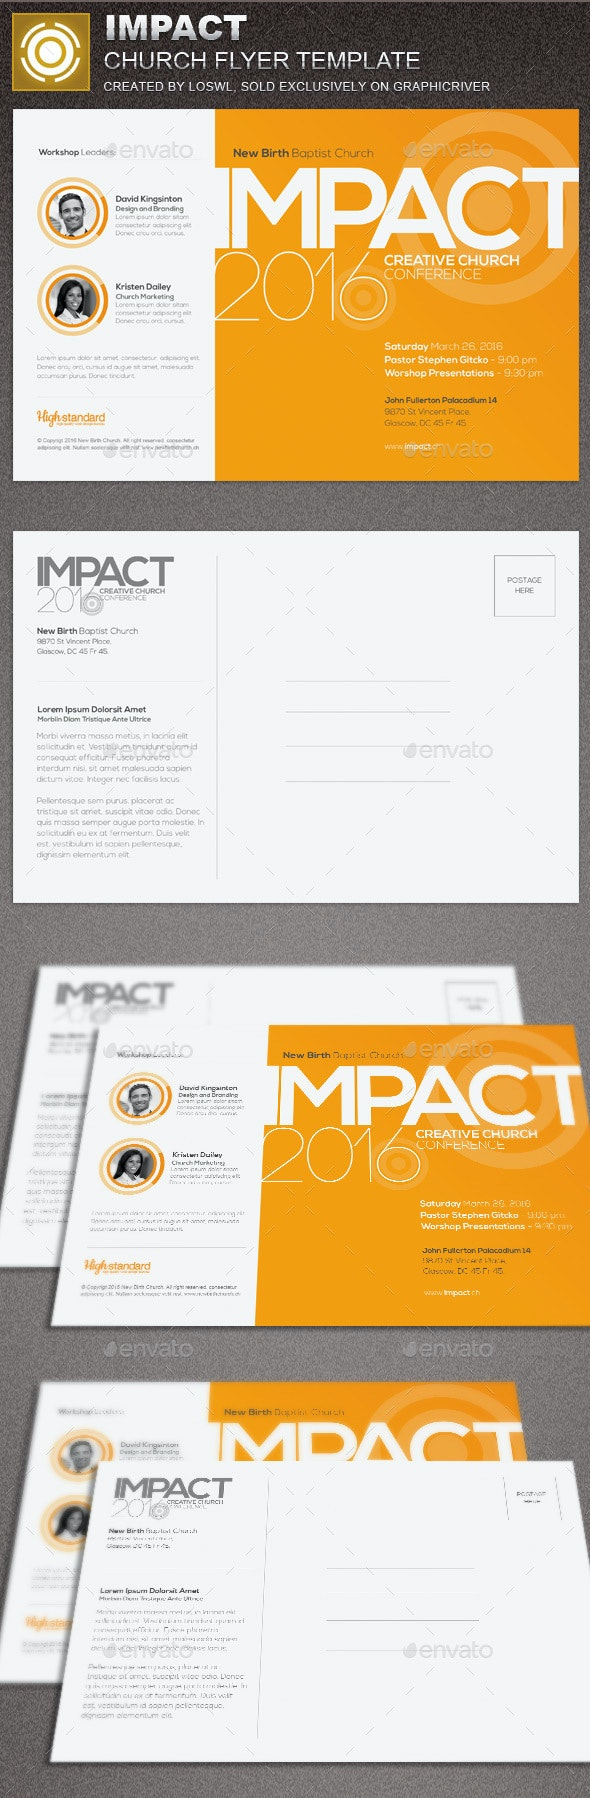 Impact Church Flyer Template - Church Flyers